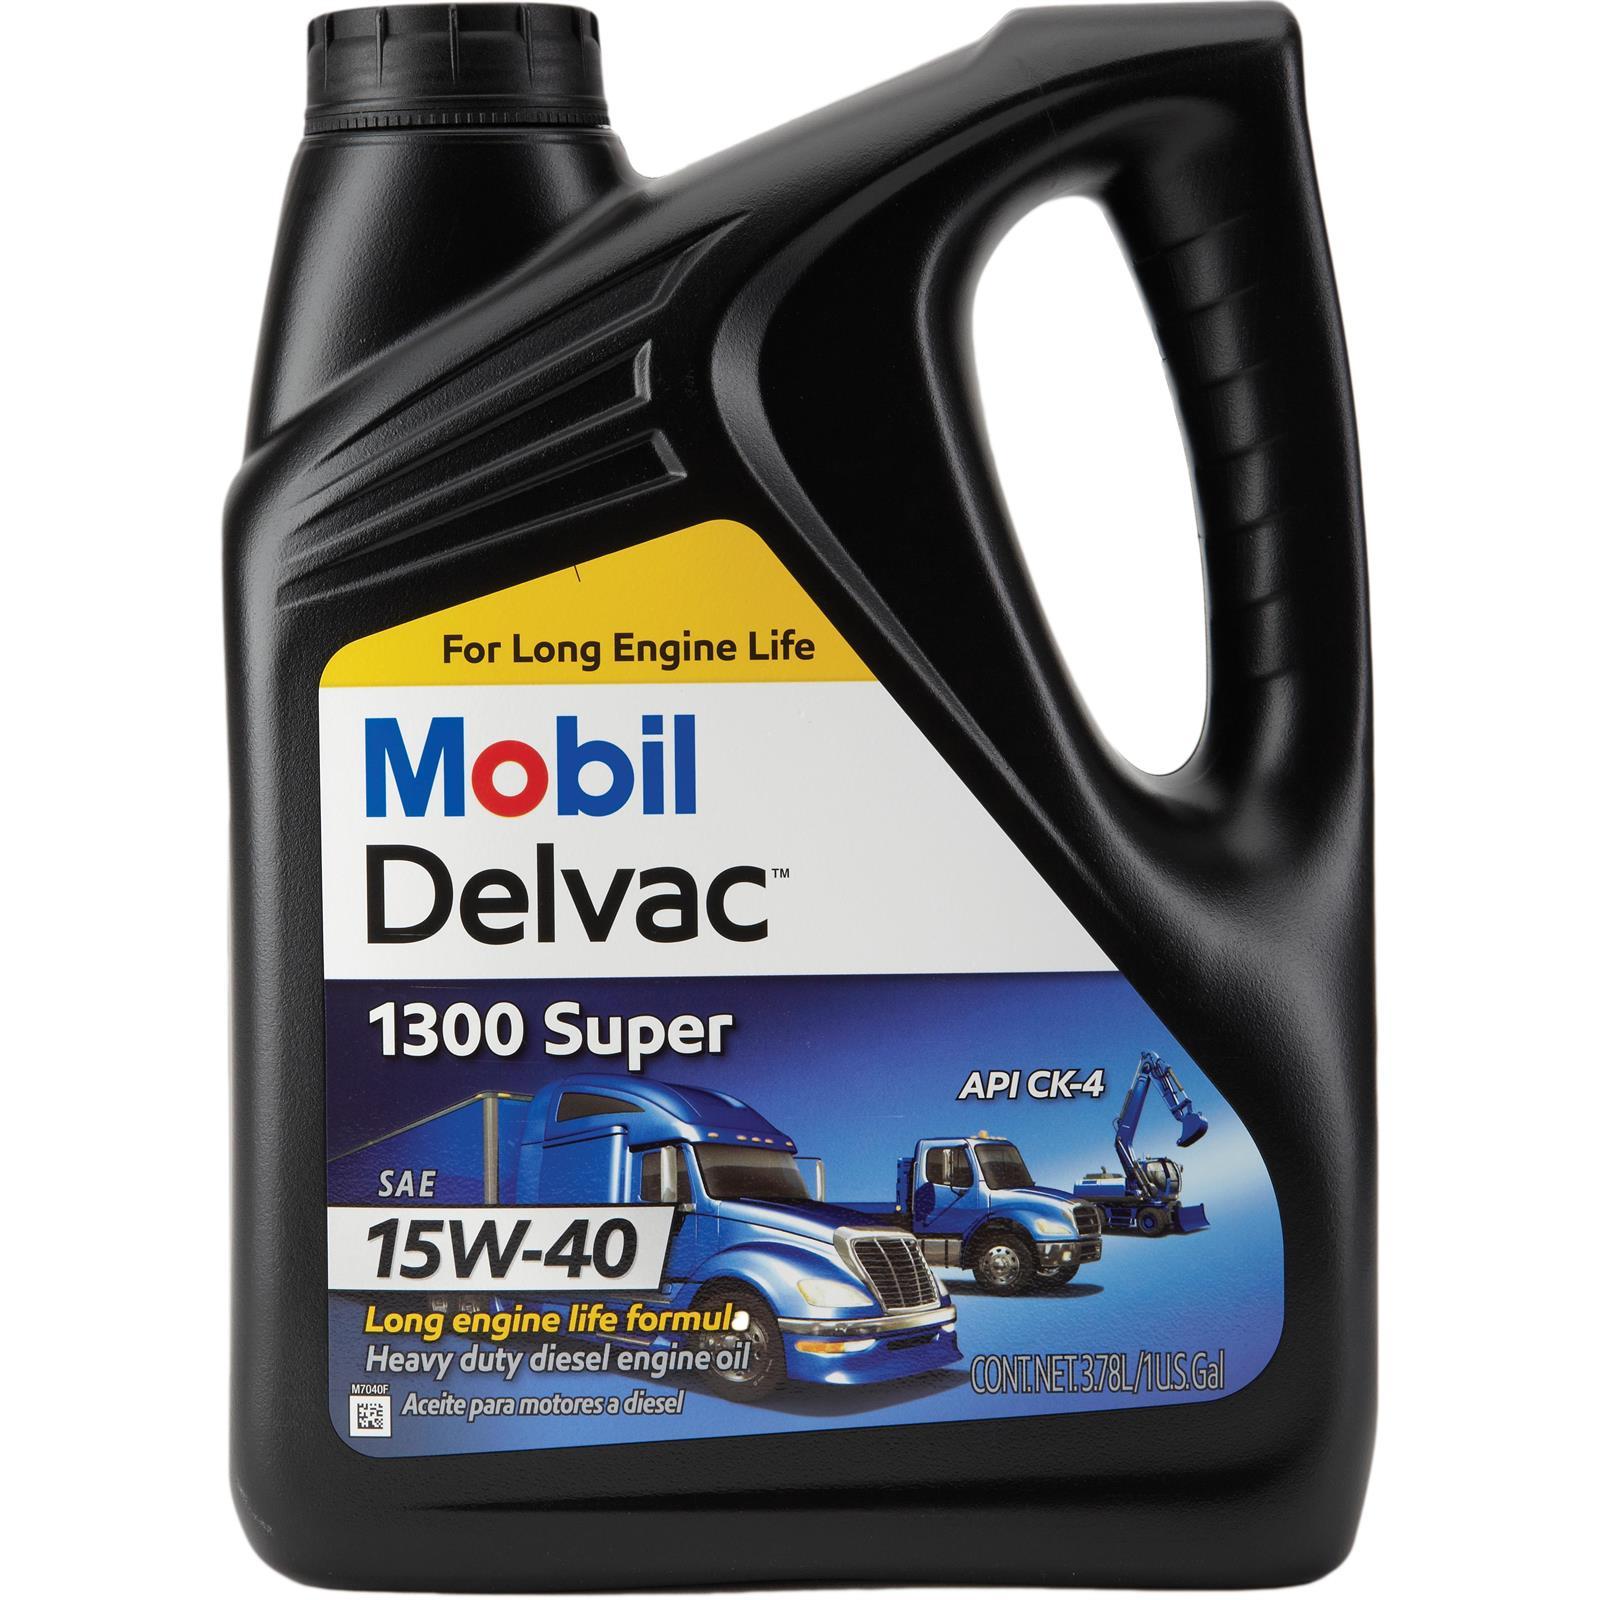 15w40 Diesel Oil >> Mobil 1 1224921 Delvac 1300 Diesel Engine Oil 15w 40 1 Gallon